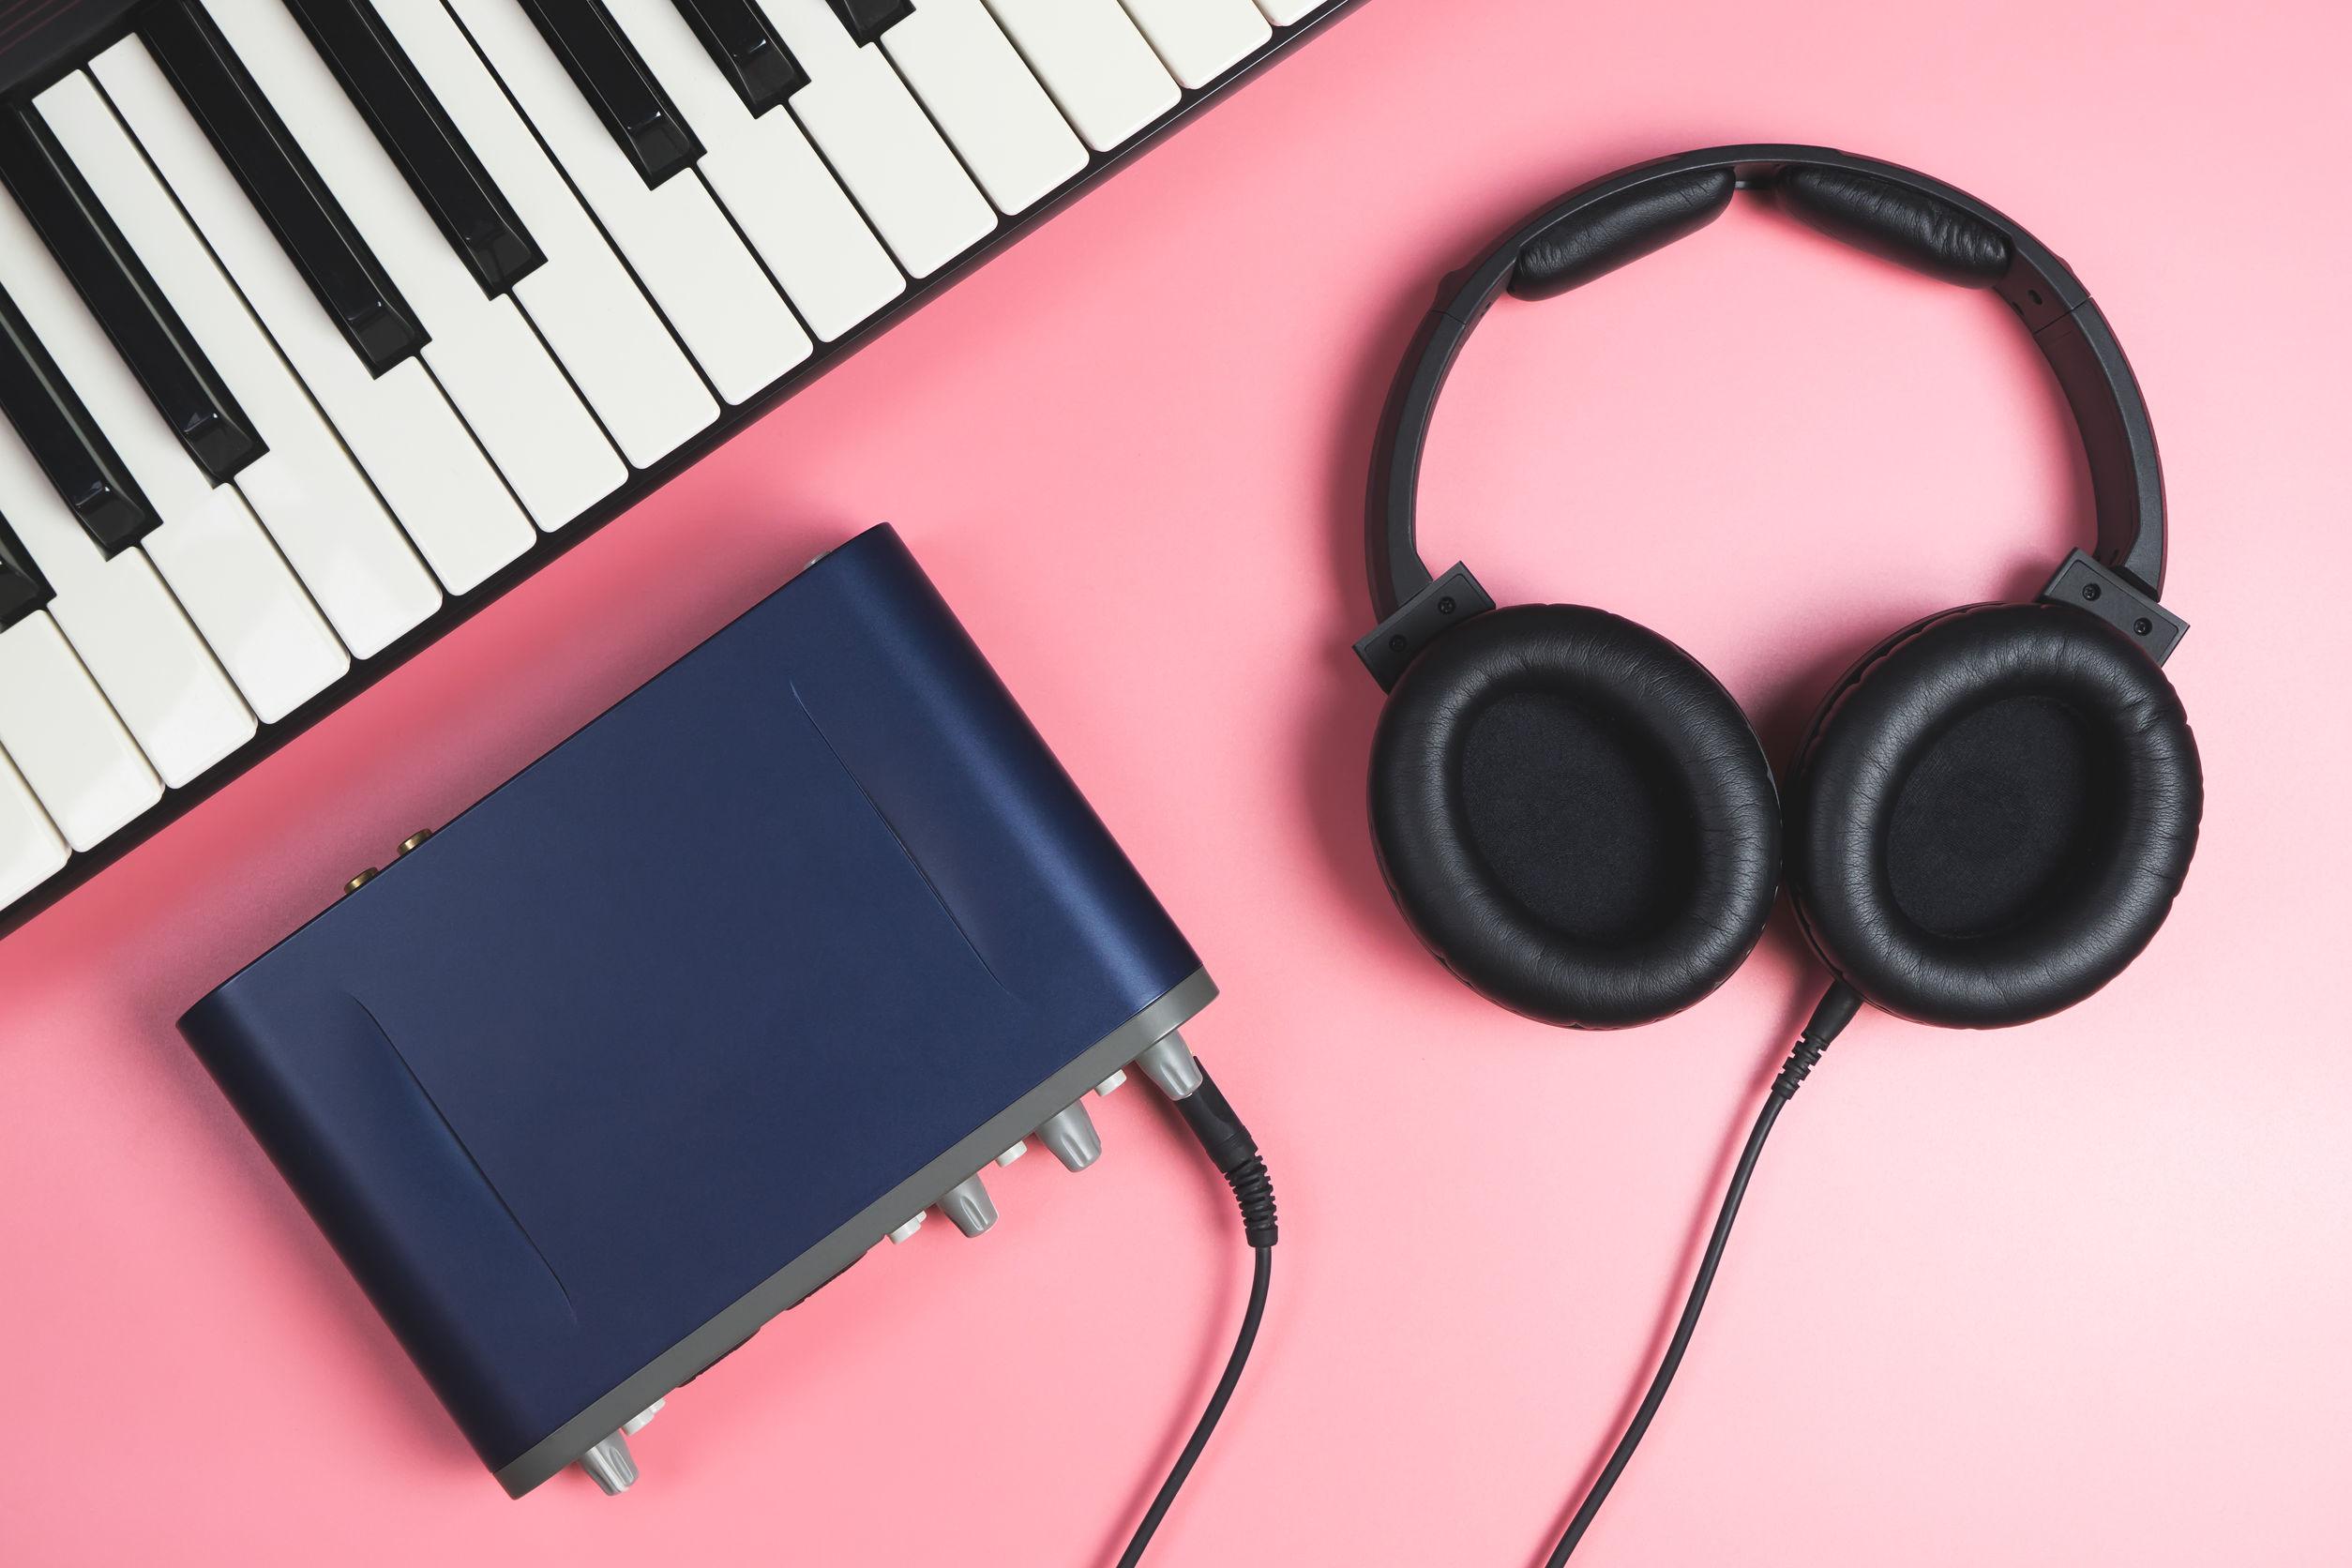 Tarjeta de sonido externa: ¿Cuál es la mejor del 2021?